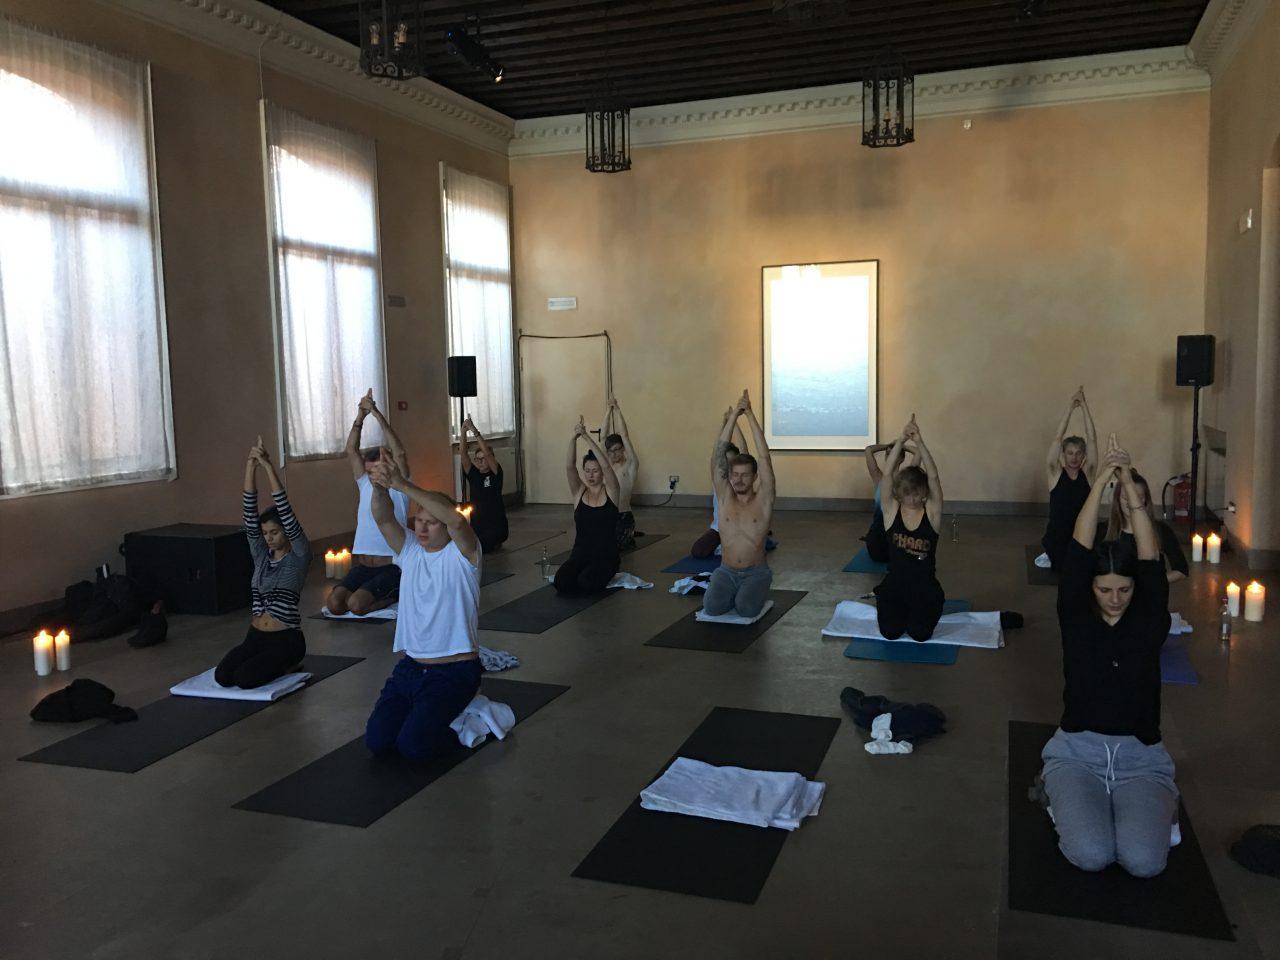 The Secret Key: Kundalini Yoga with Che Ahlers, 2016   Zuecca Project Space, Venice, Italy   Artwork: © Slater B. Bradley   Courtesy of Slater Bradley Studio, Berlin and Galeria Filomena Soares, Lisbon   Photo: Slater Bradley Studio